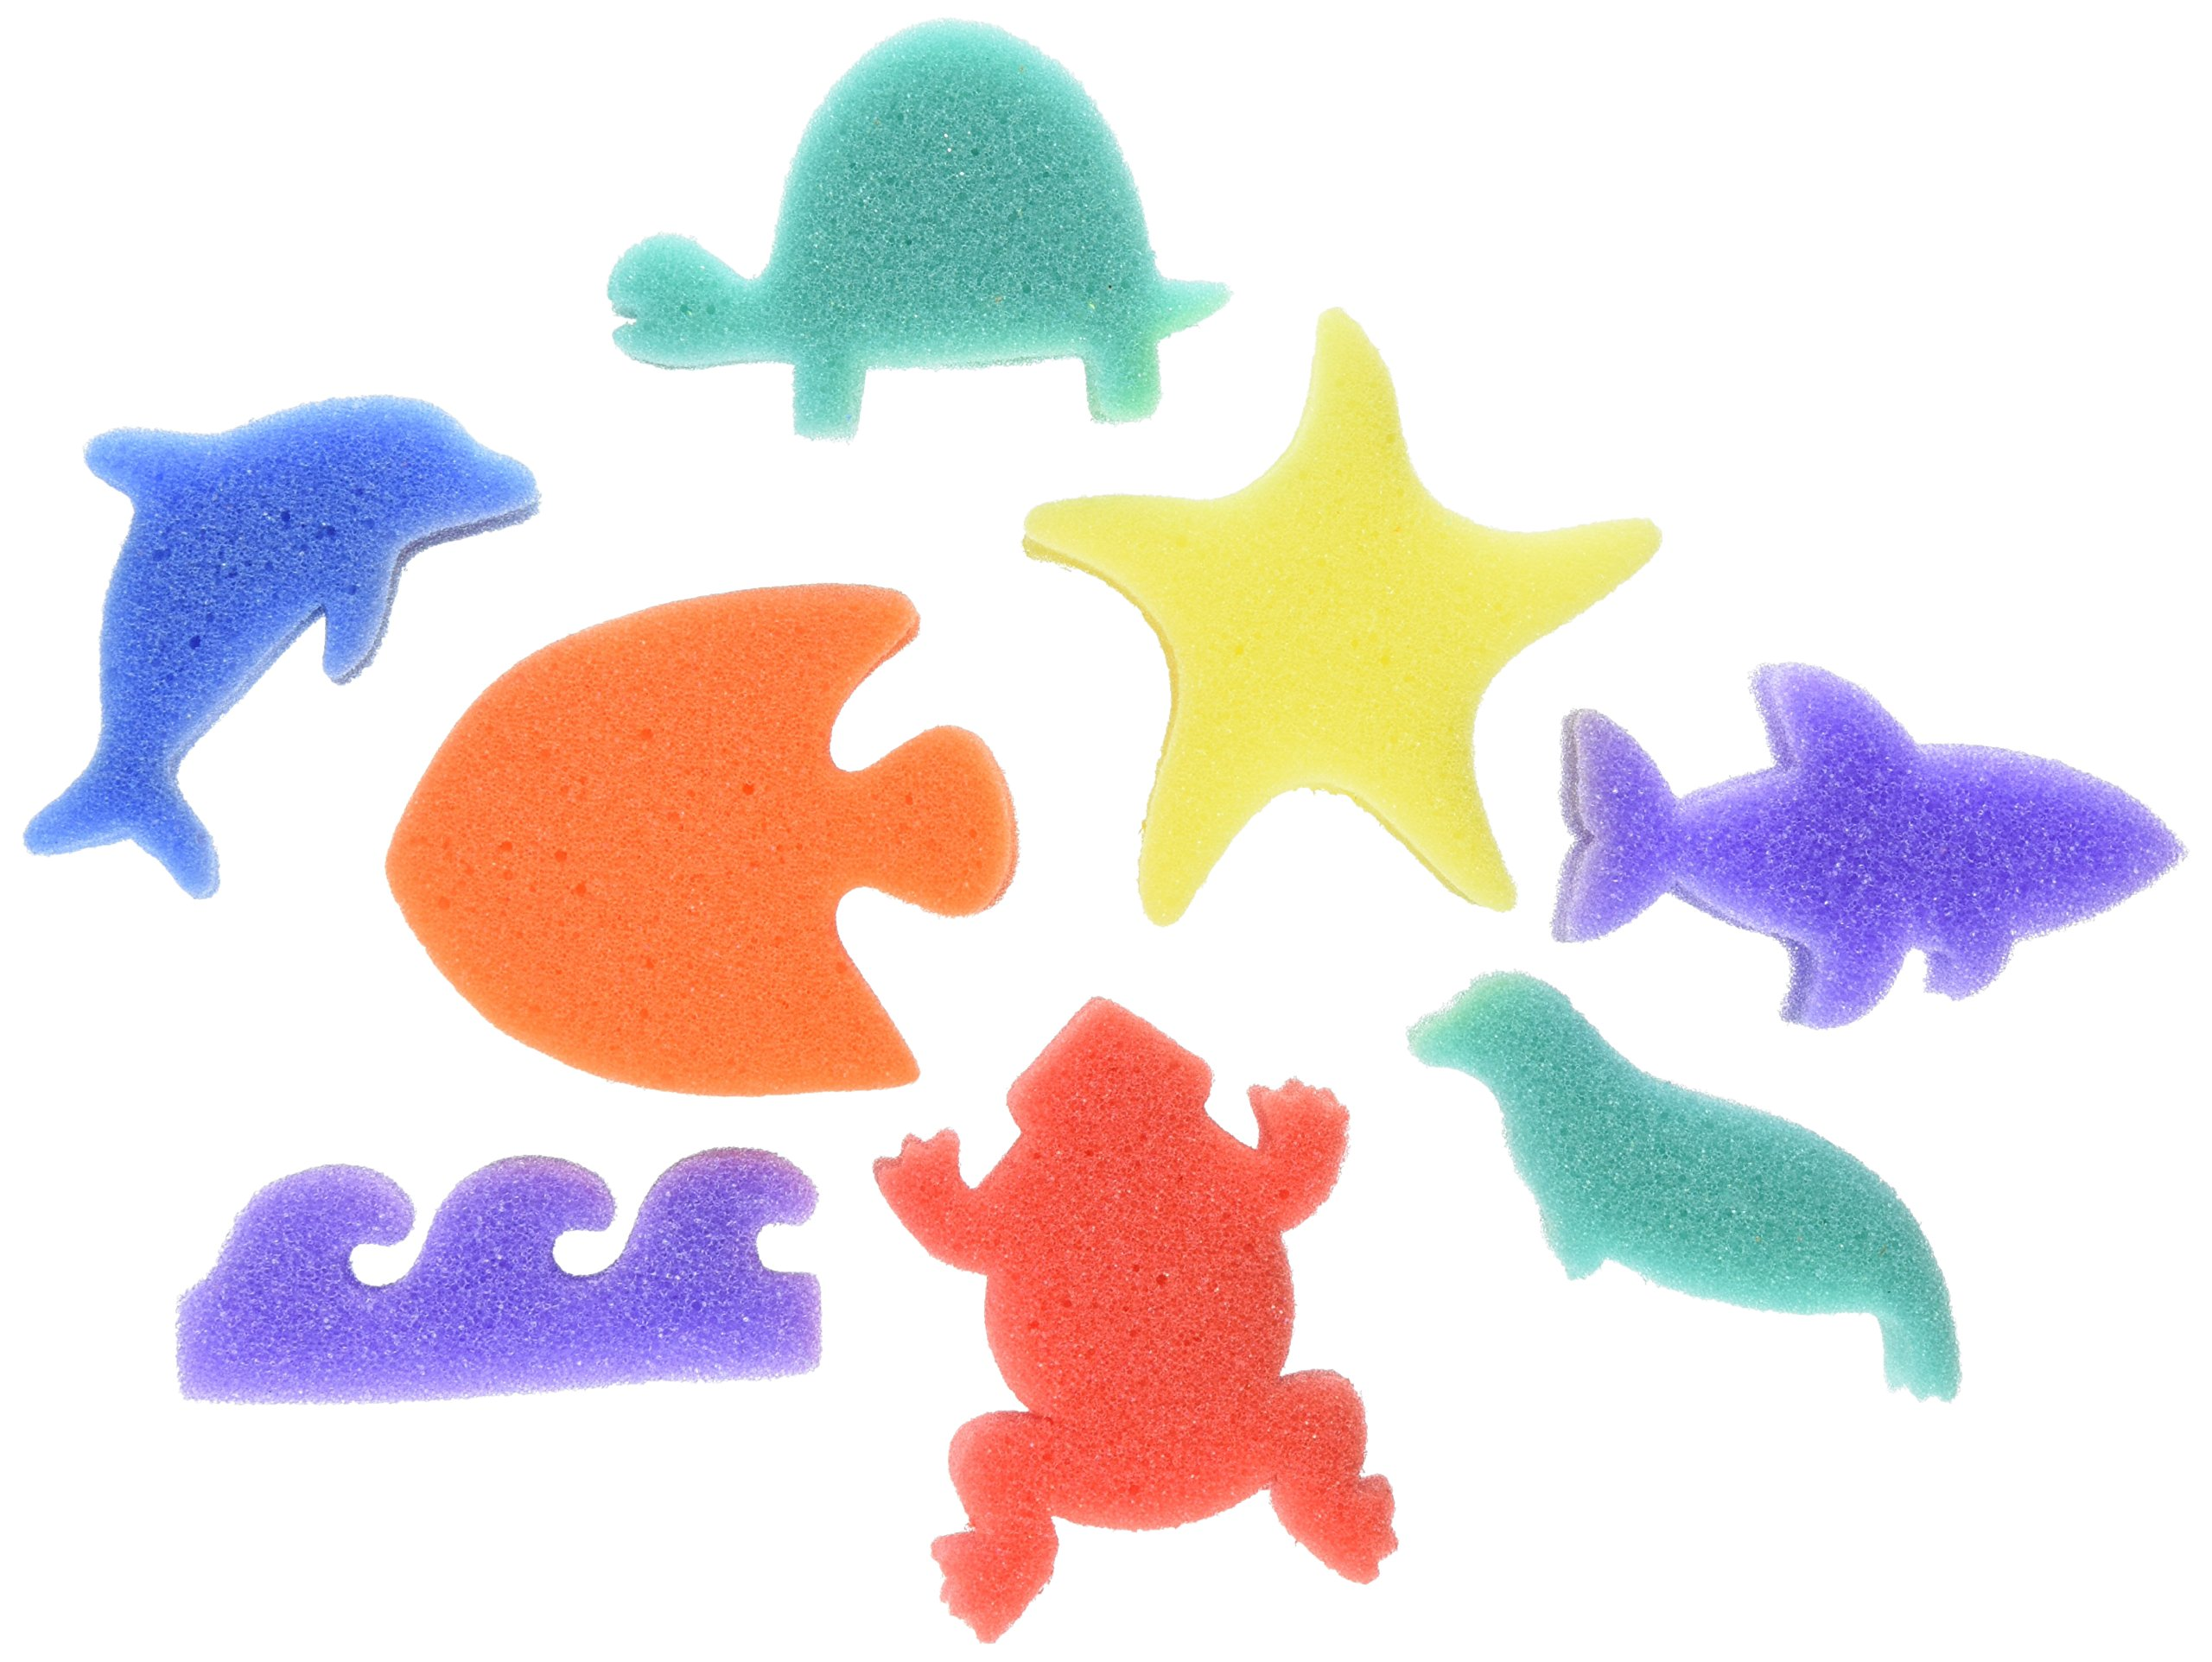 Creativity Street AC9073 Ocean Paint Sponge, 3'' Size (Pack of 8) by Creativity Street